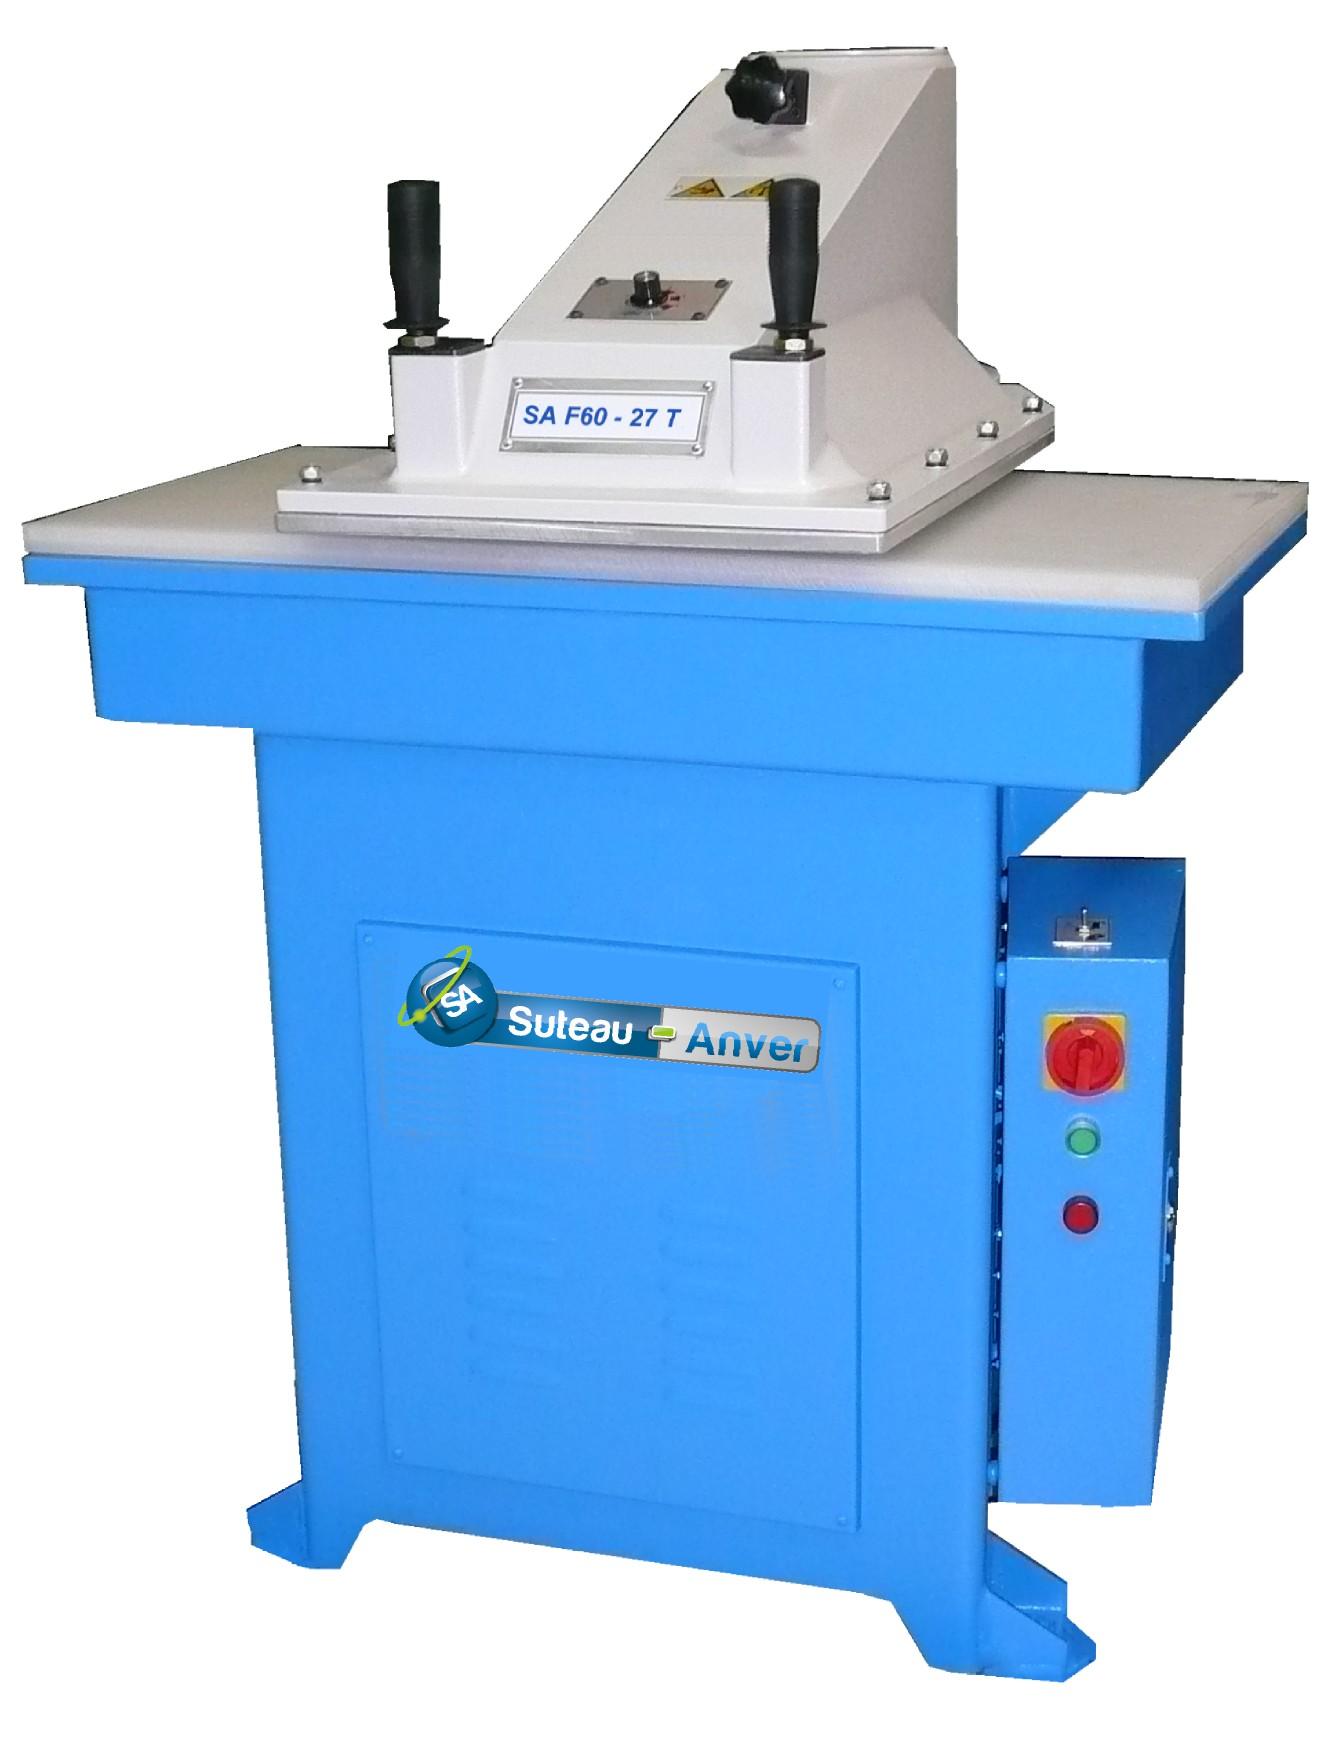 Prensa de corte de brazo giratorio hidráulico – Modelo SA F60